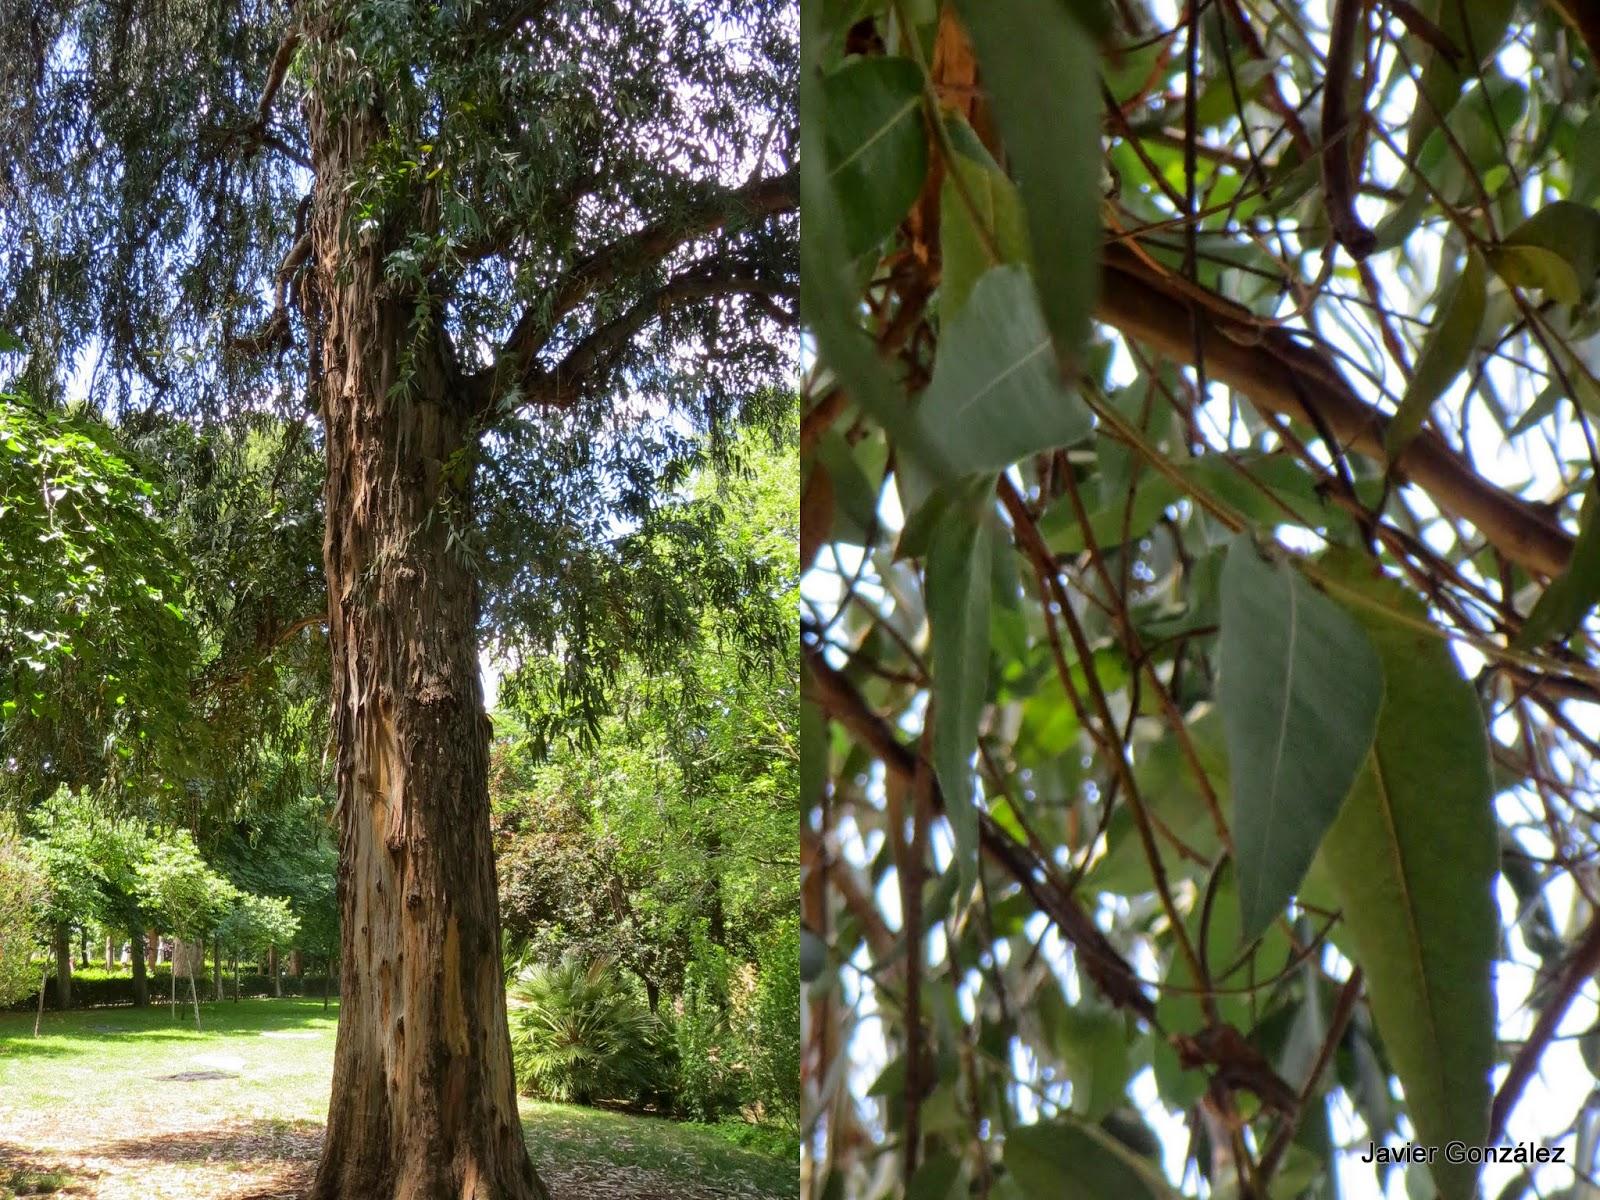 Parque del Retiro. Madrid. Eucalipto / Eucaliptus